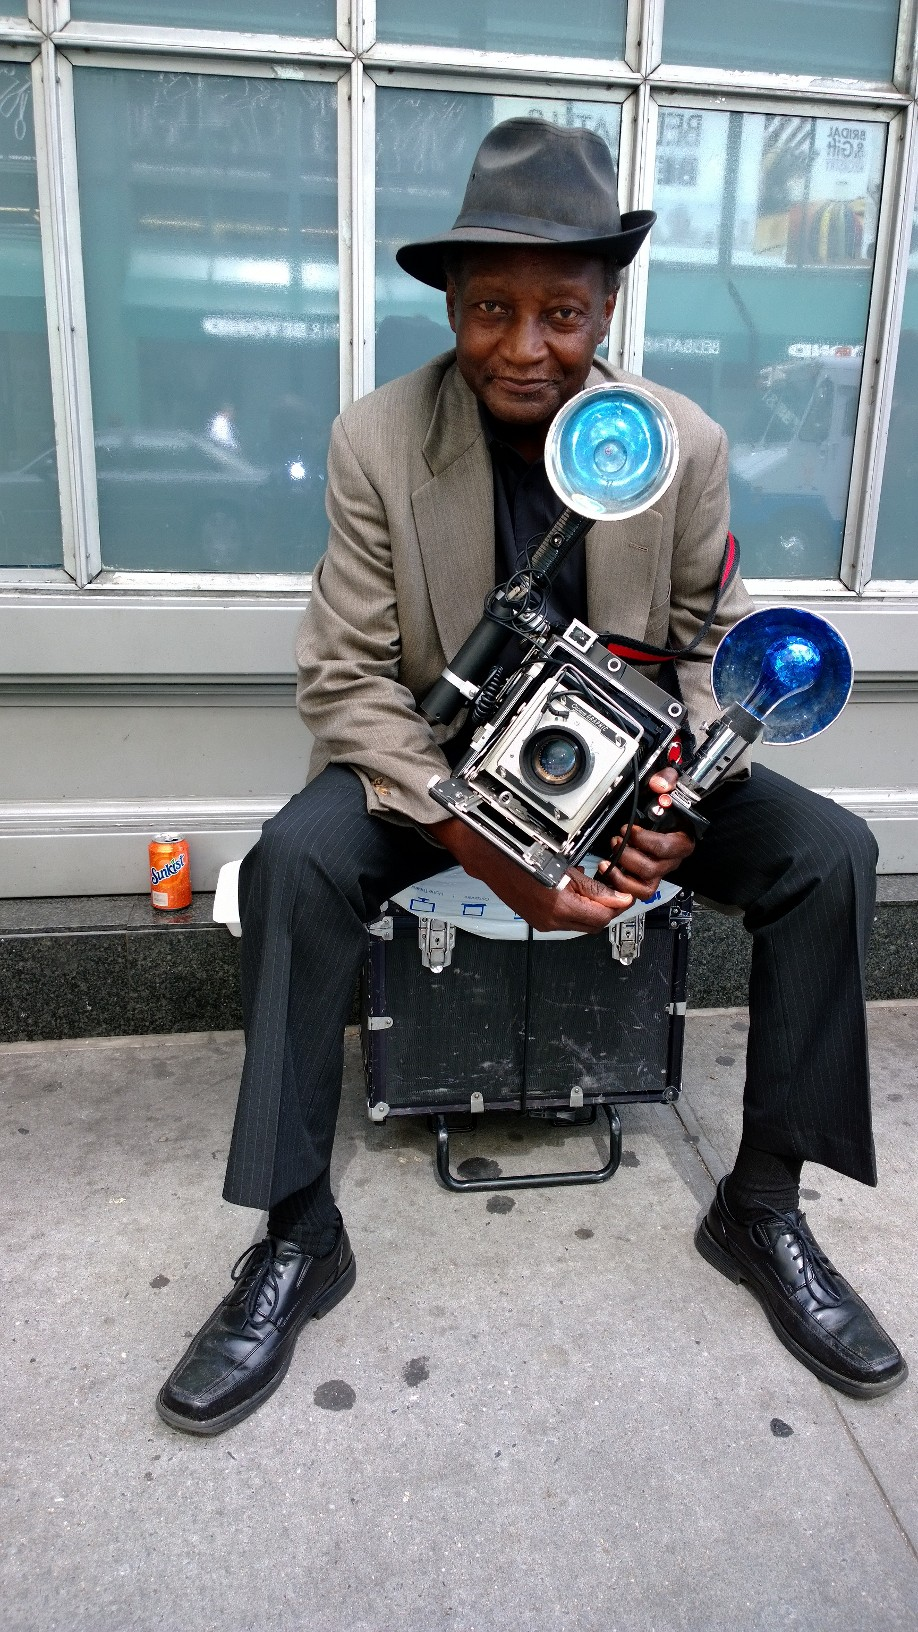 Street Photographer, New York City, 2013   Copyright Jim Cummins